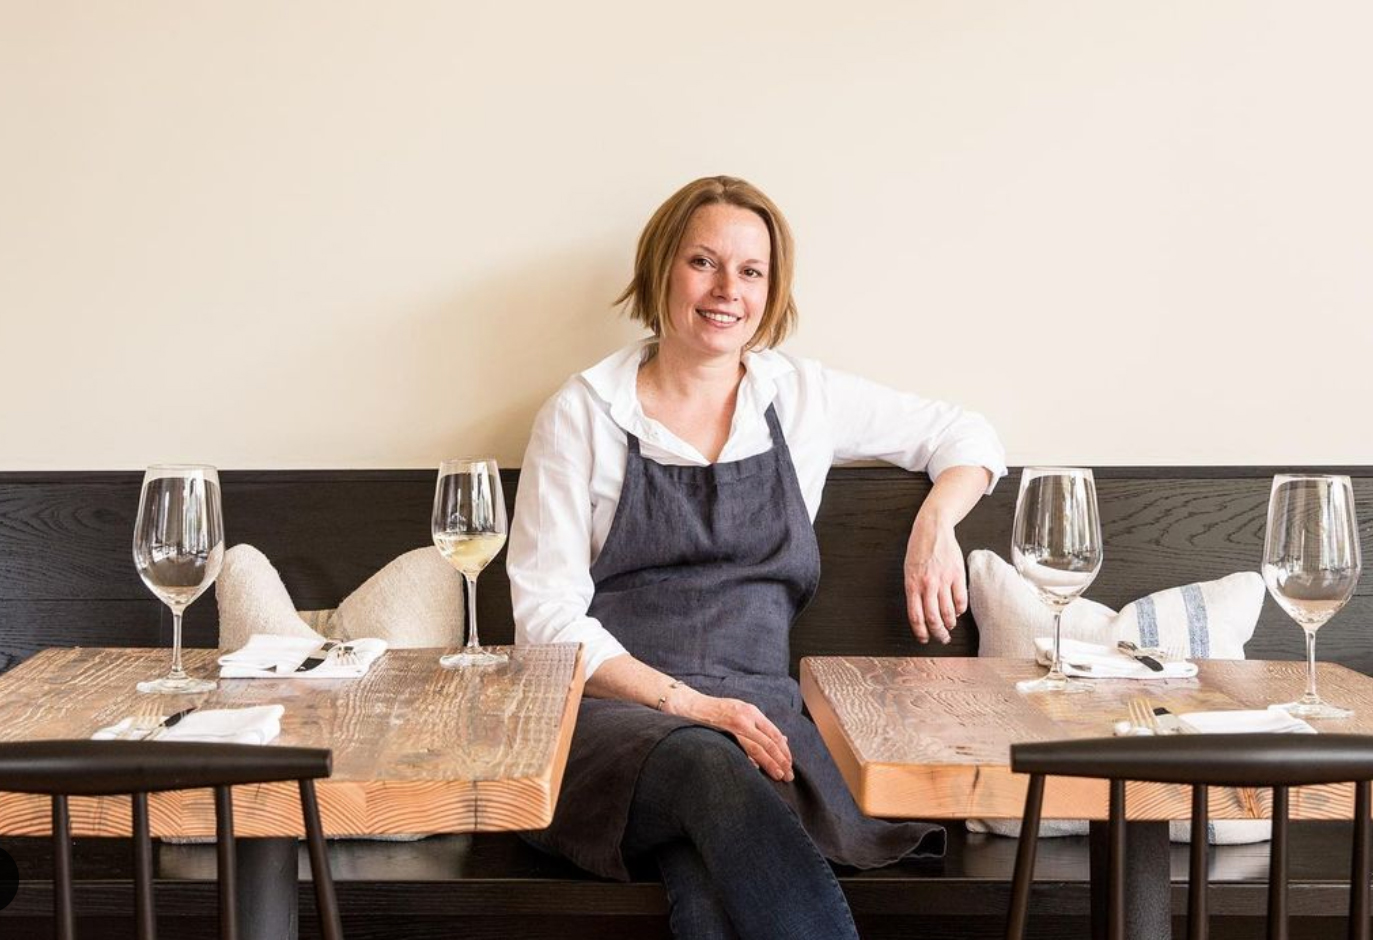 California Female Chefs